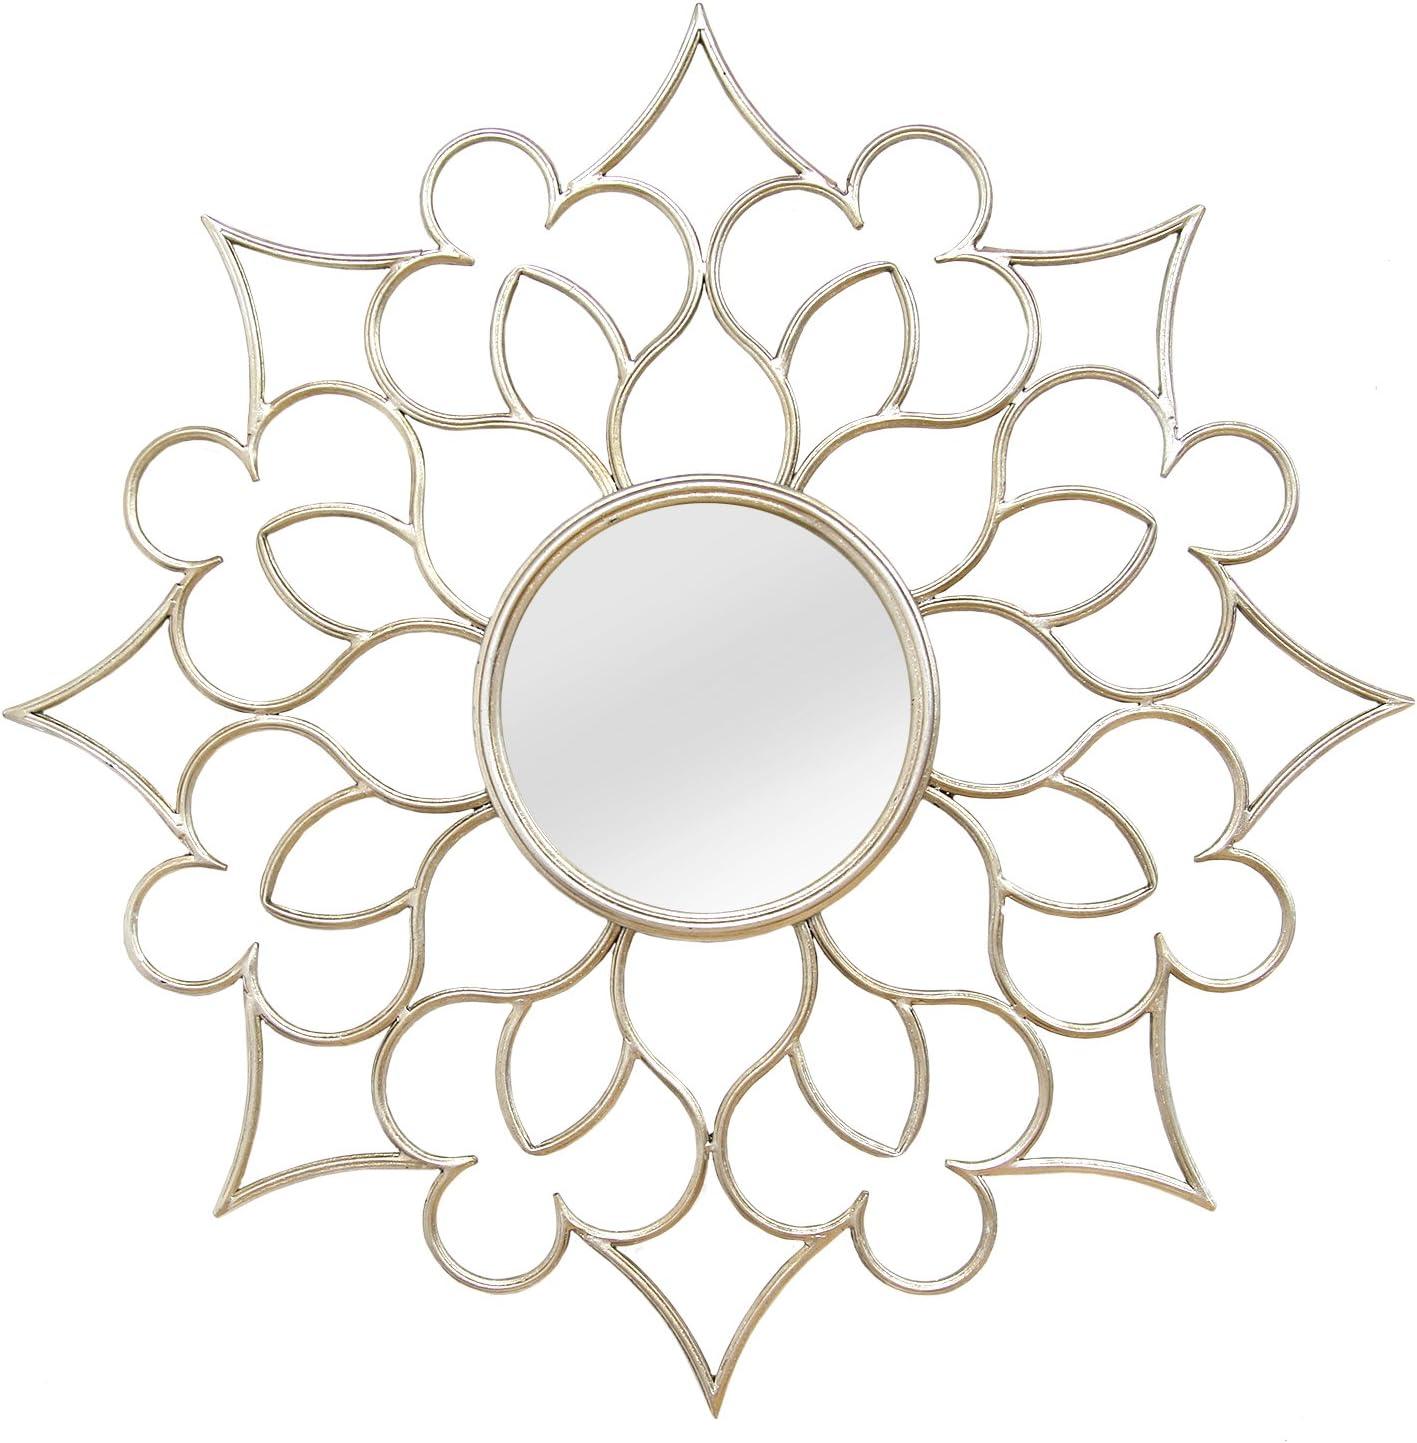 Stratton Home Decor SHD0145 Francesca Wall Mirror, 24.00 W X 1.75 D X 24.00 H, Silver